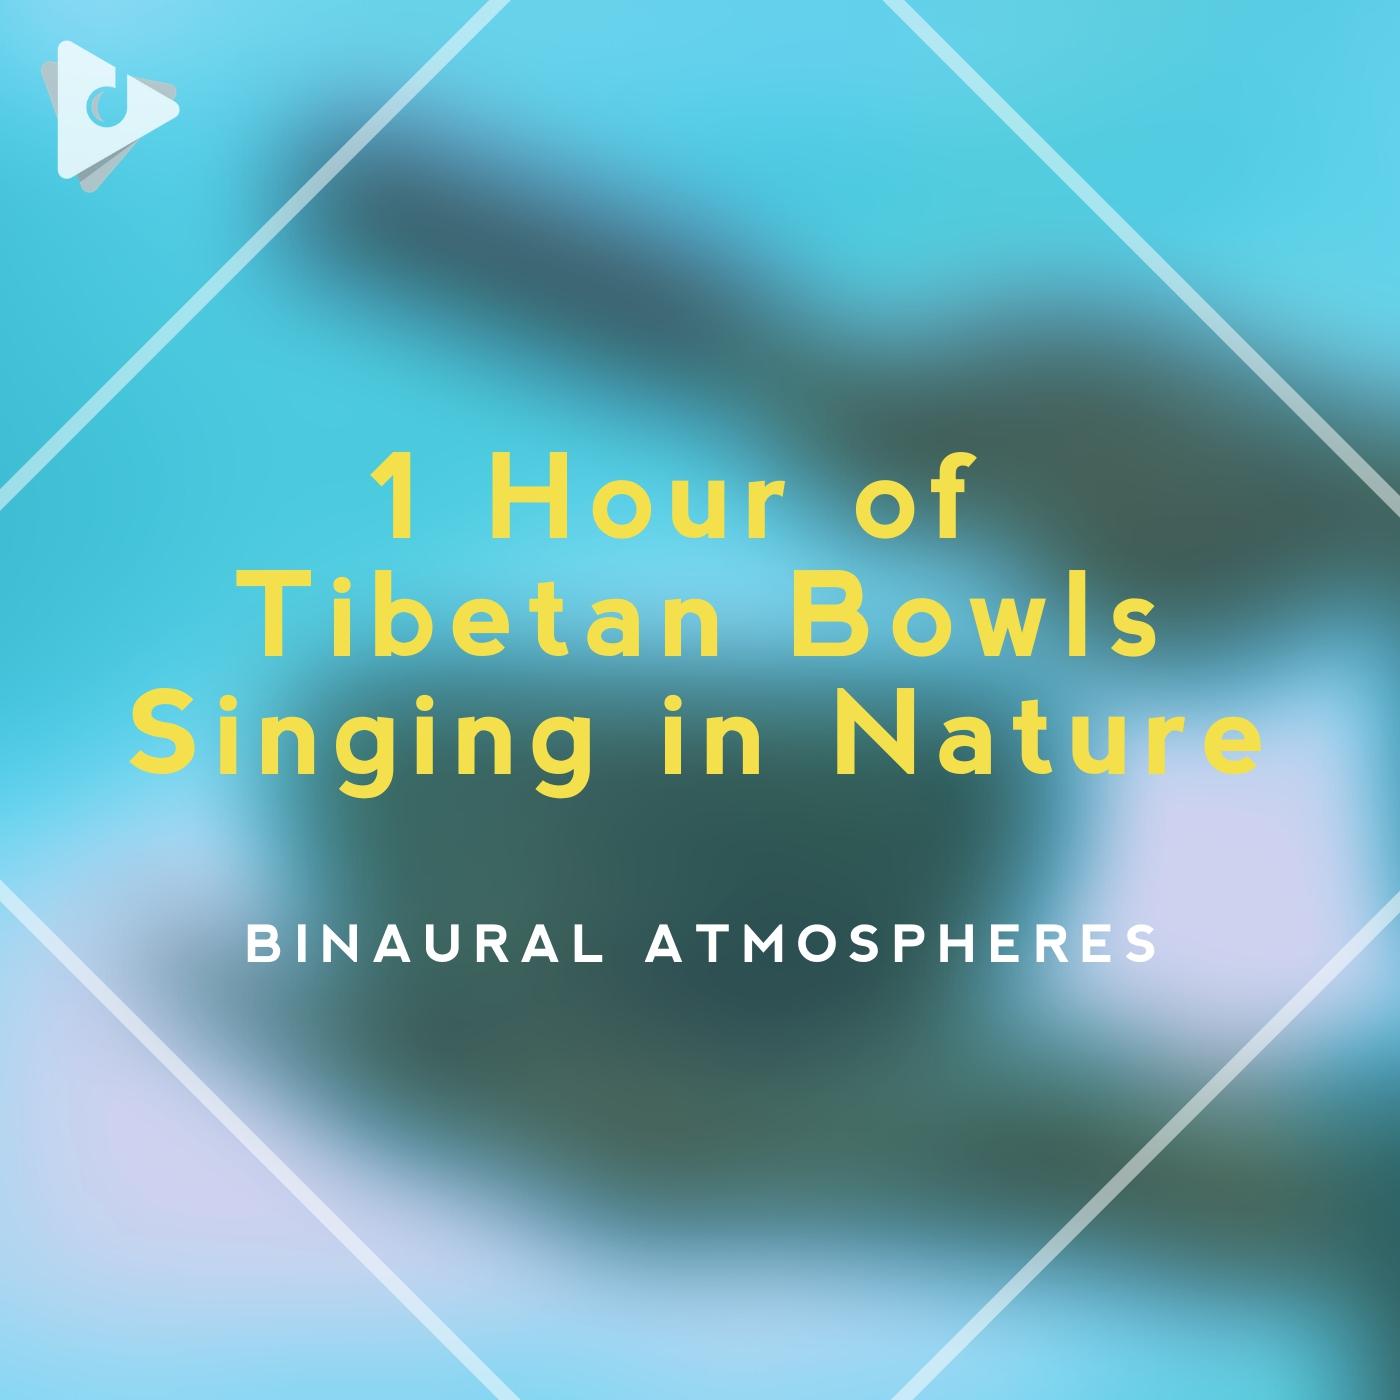 1 Hour of Tibetan Bowls Singing in Nature